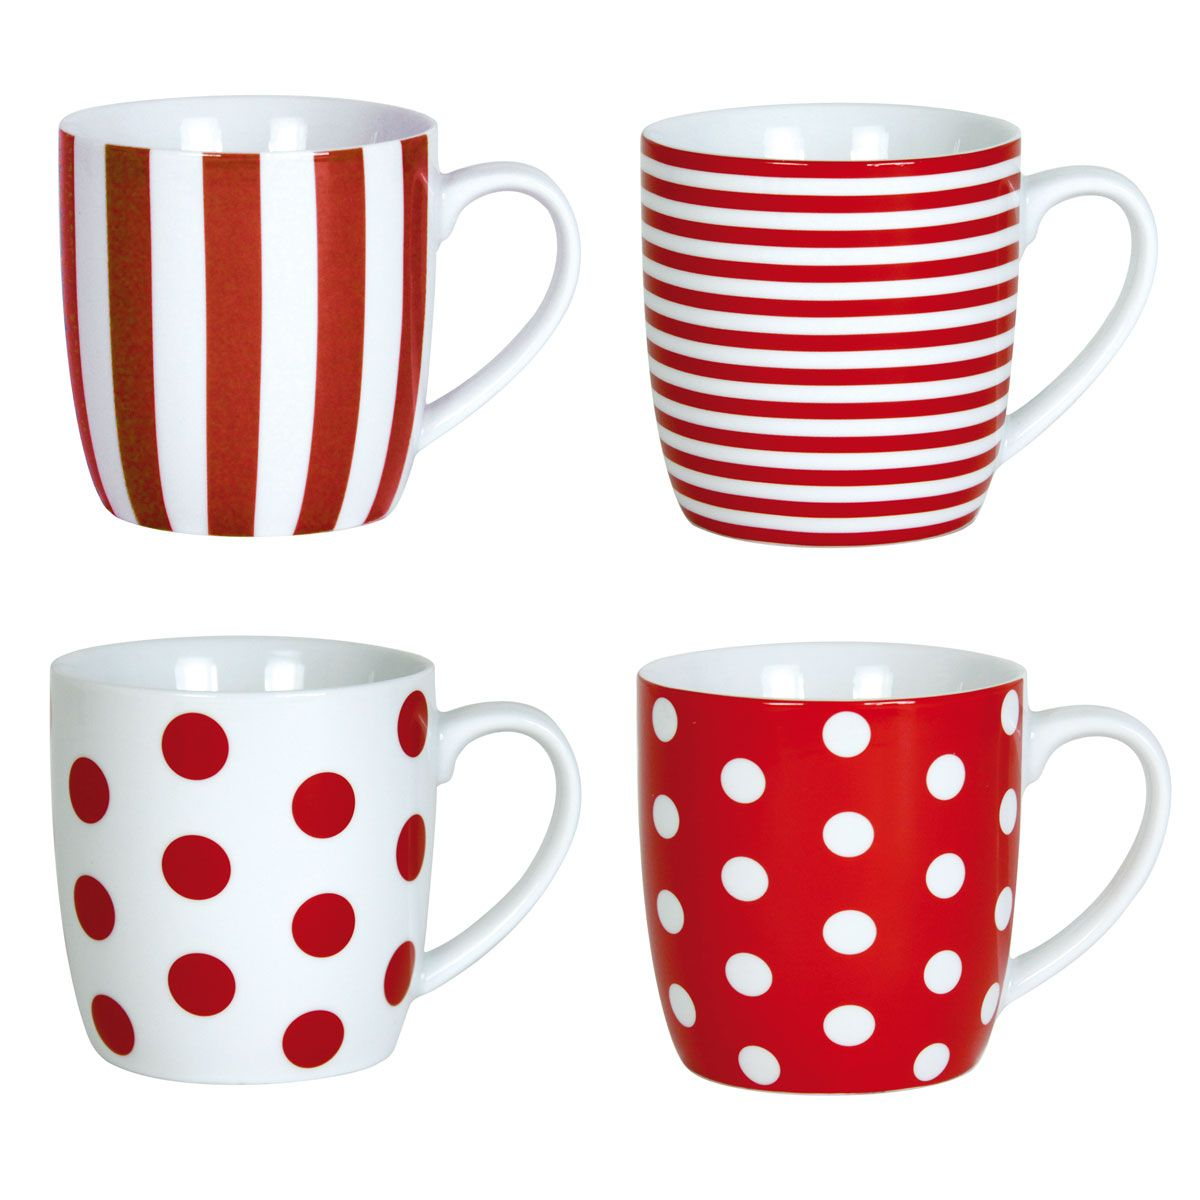 Mugs Stripes And Dots Red Mug Mugs Dinnerware Sets Hd wallpaper red mug garland light